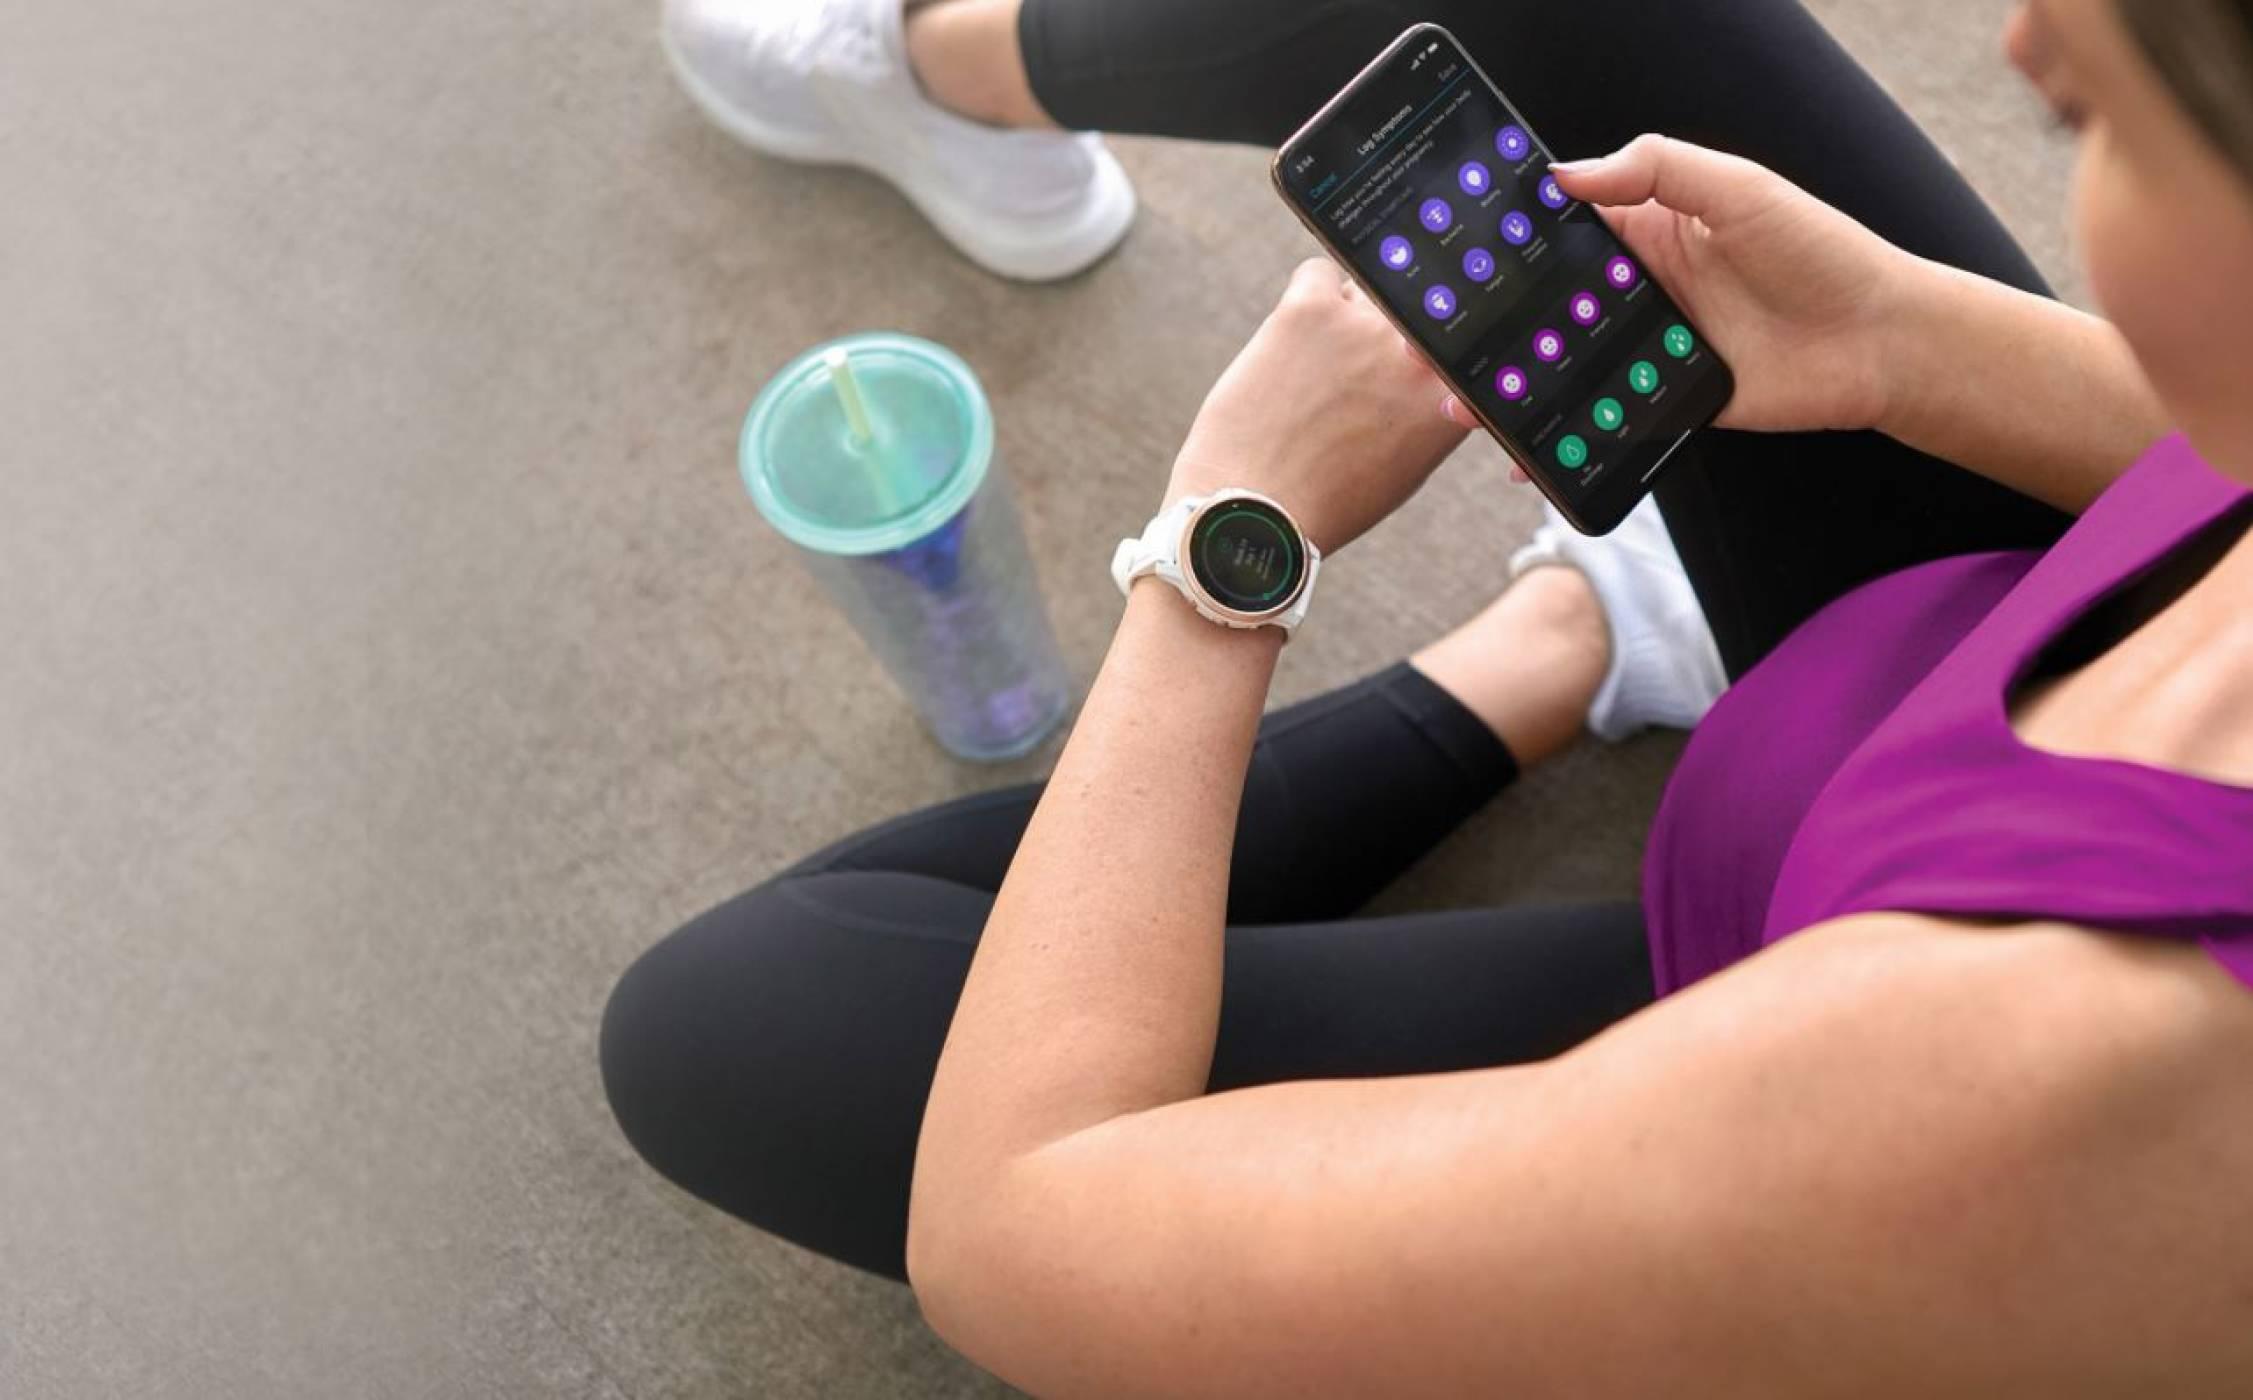 Garmin добавя към смарт часовниците си следене на детайли около бременността (ВИДЕО)